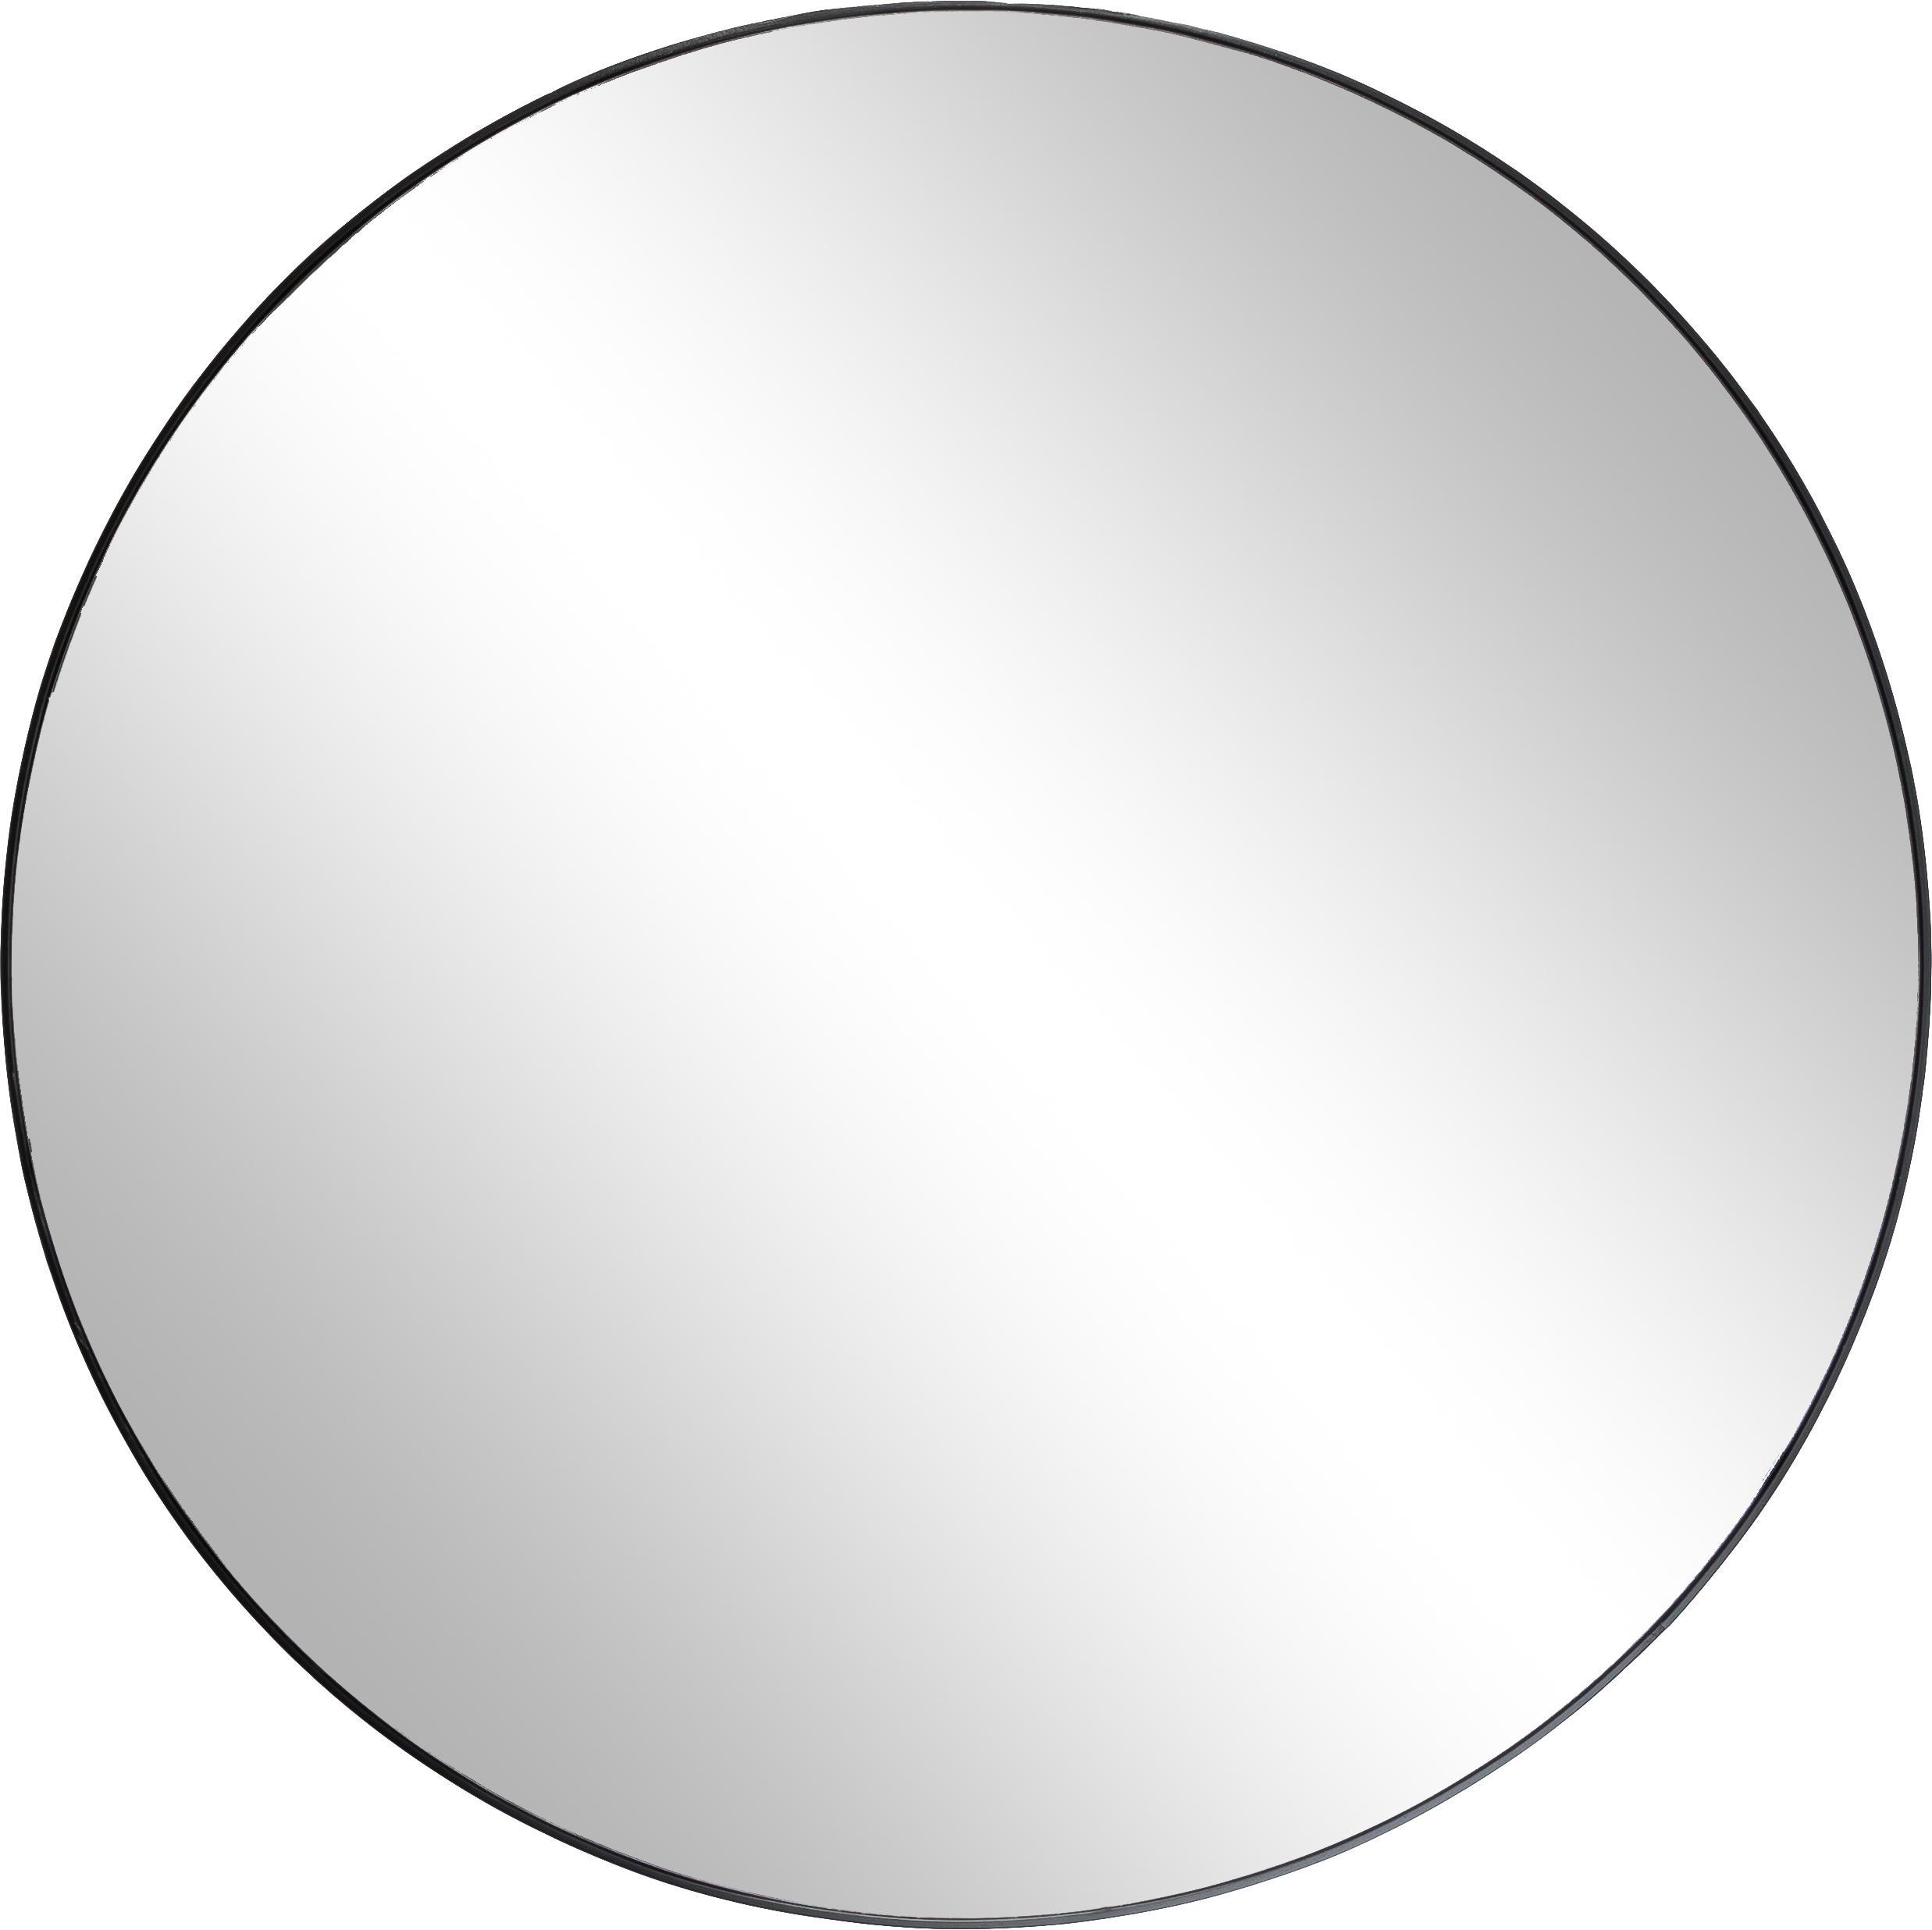 Ronde wandspiegel Complete met zwarte lijst, Frame: gelakt MDF, Zwart, Ø 100 cm